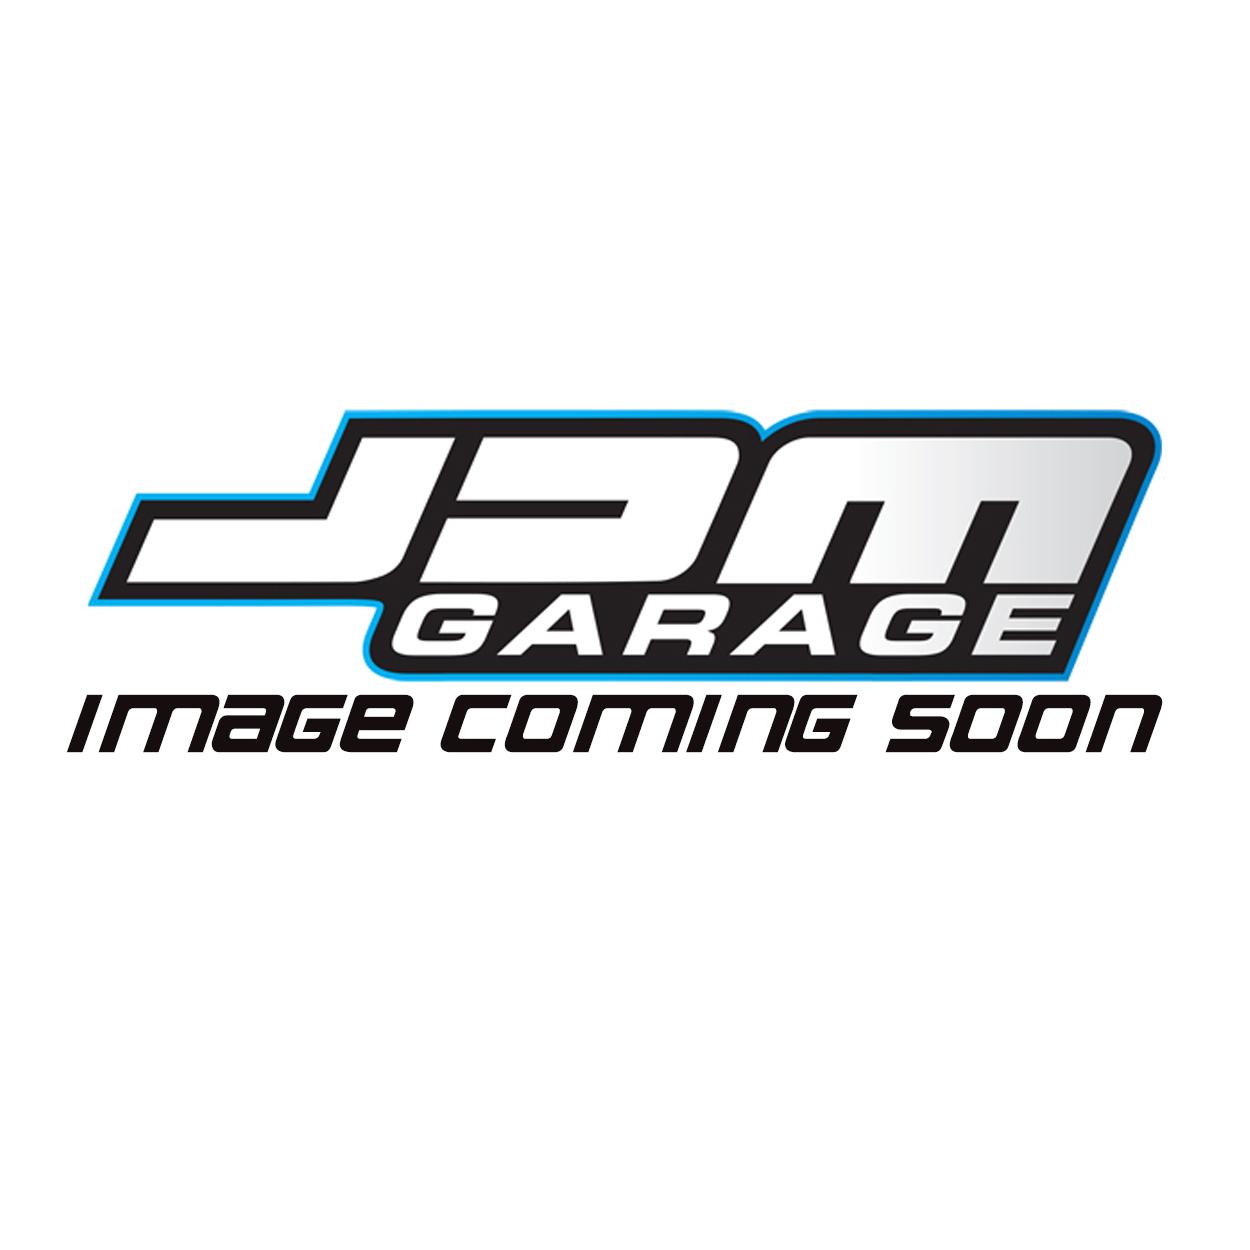 Xtreme Clutch & Flywheel - Organic / Ceramic / Carbon / Single & Twin Plate - Mitsubishi Lancer EVO 1 / 2 / 3 (6 Bolt Crank)